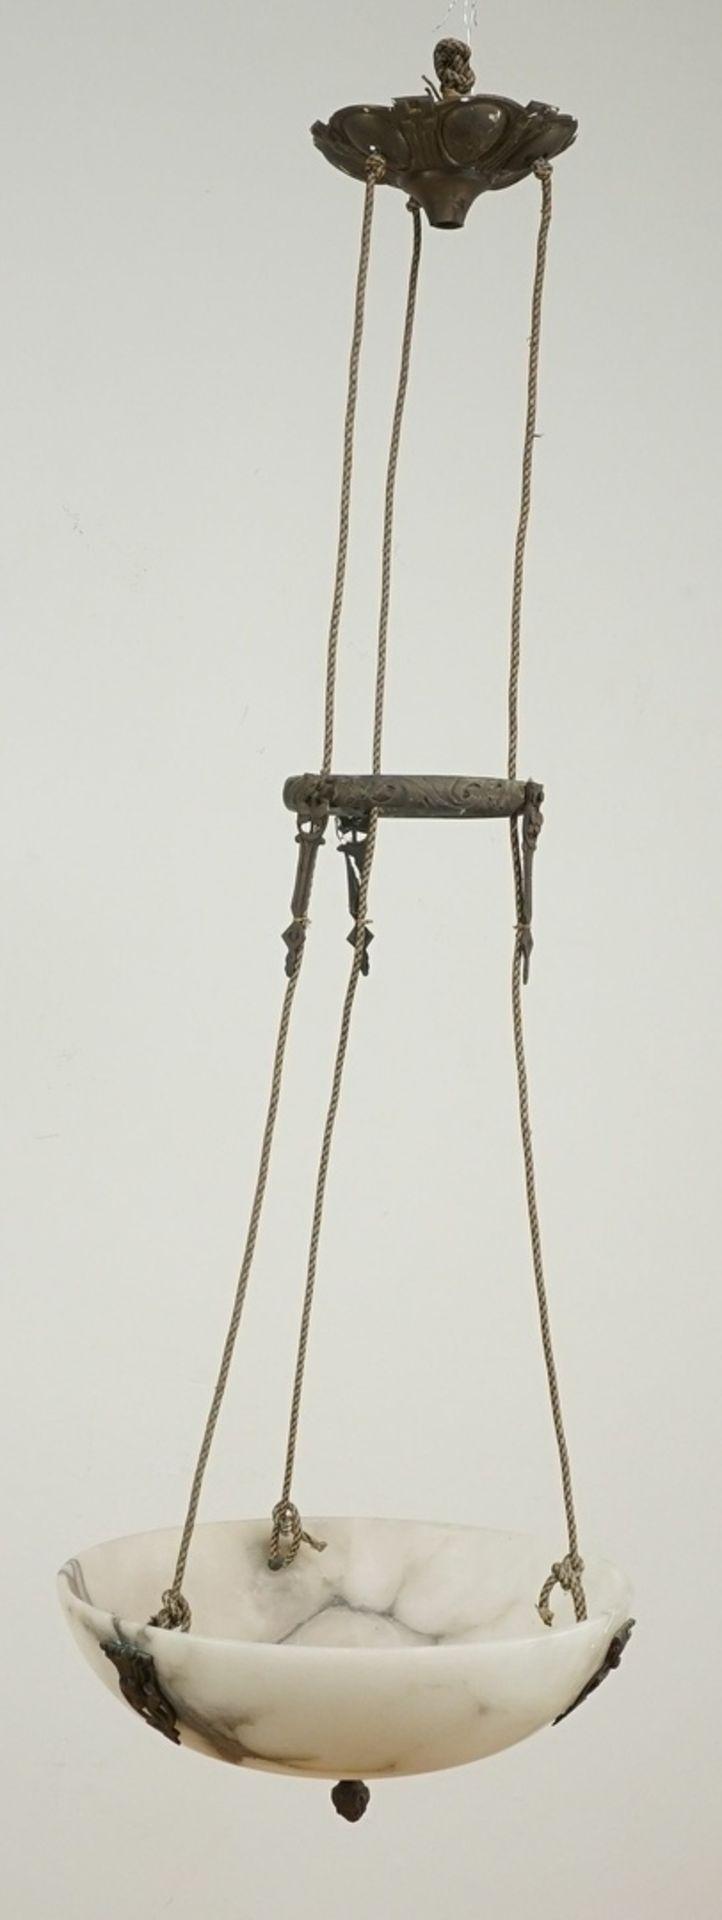 Marmor Deckenlampe, um 1900